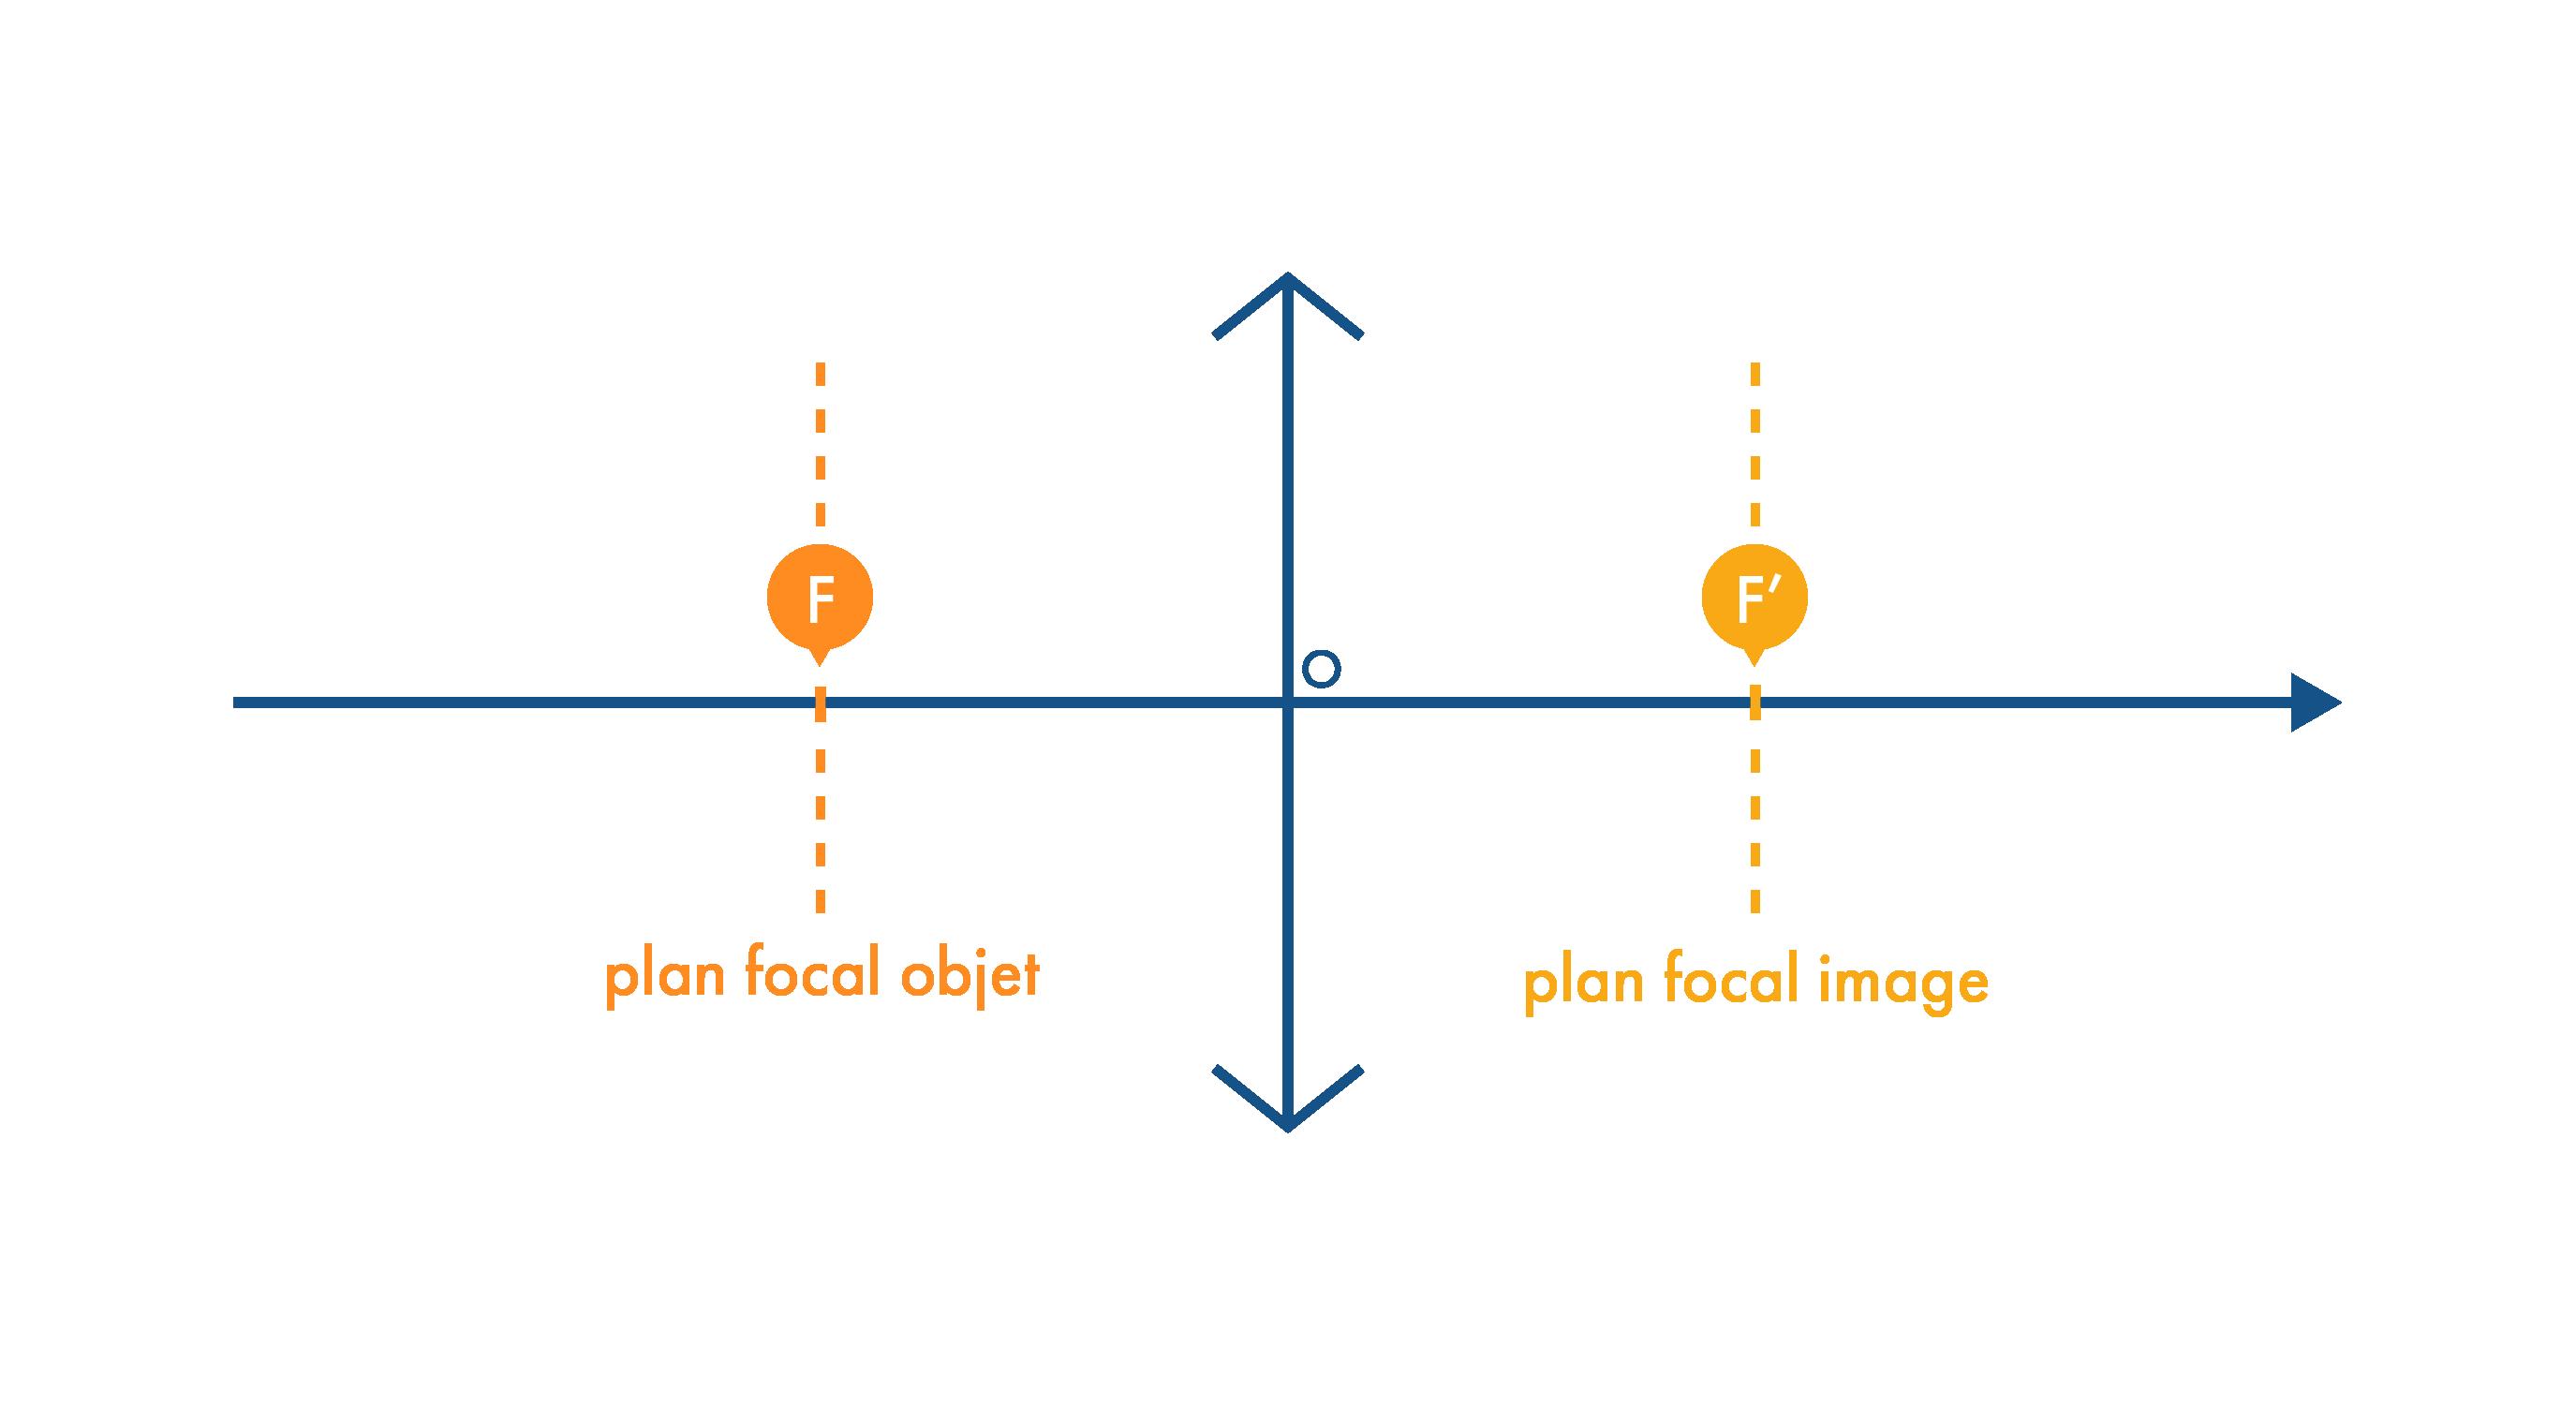 Emplacement du plan focal objet et du plan focal image